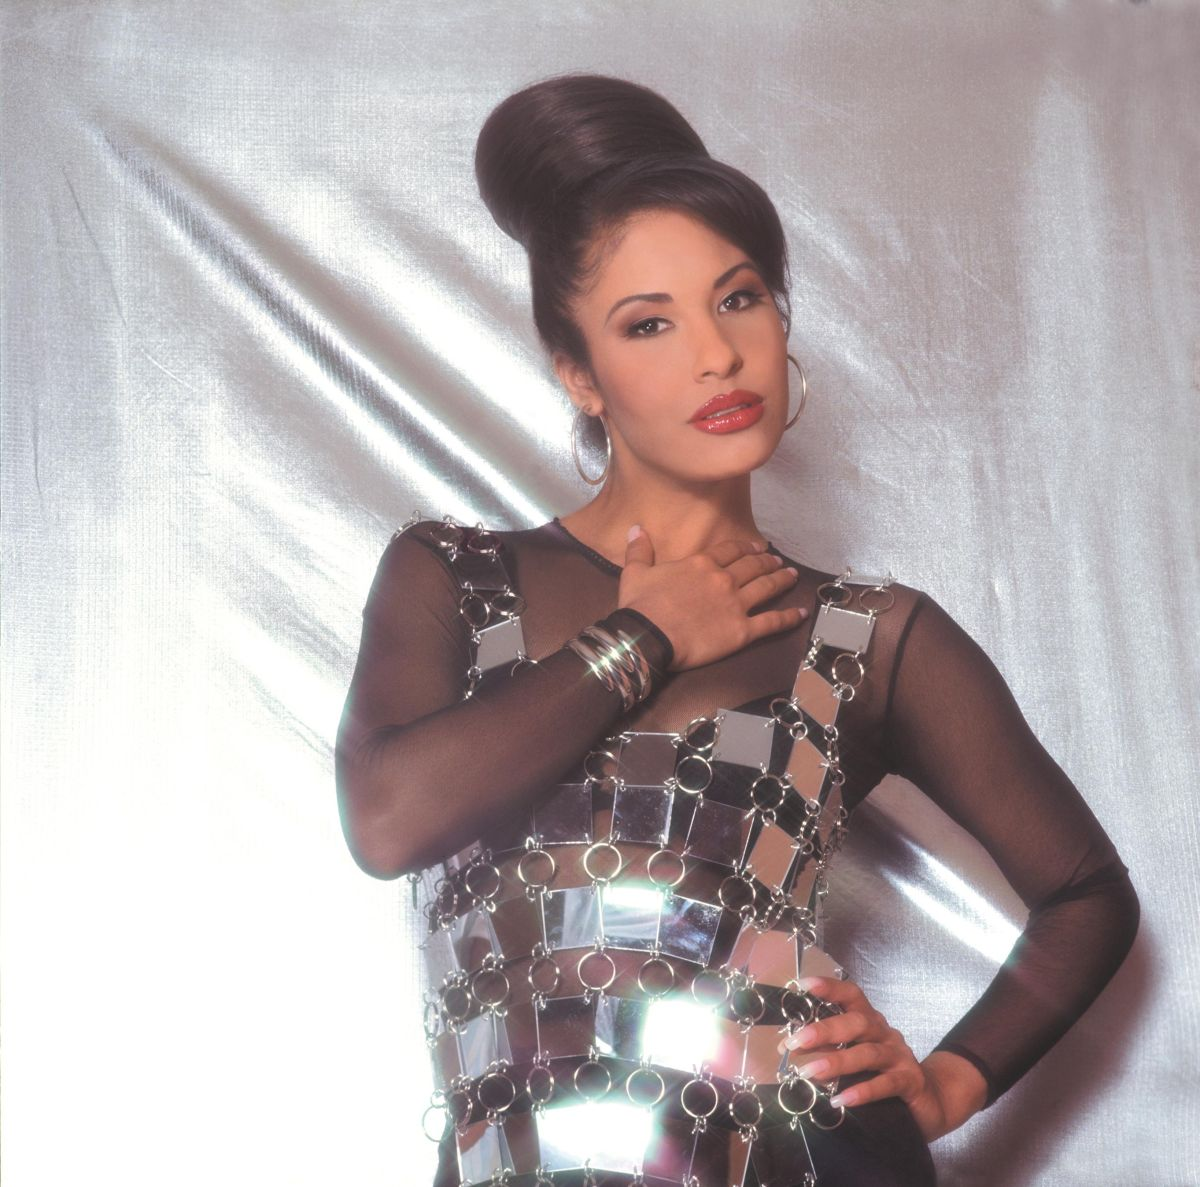 La Víbora: Por fin, honor a Selena Quintanilla en Hollywood